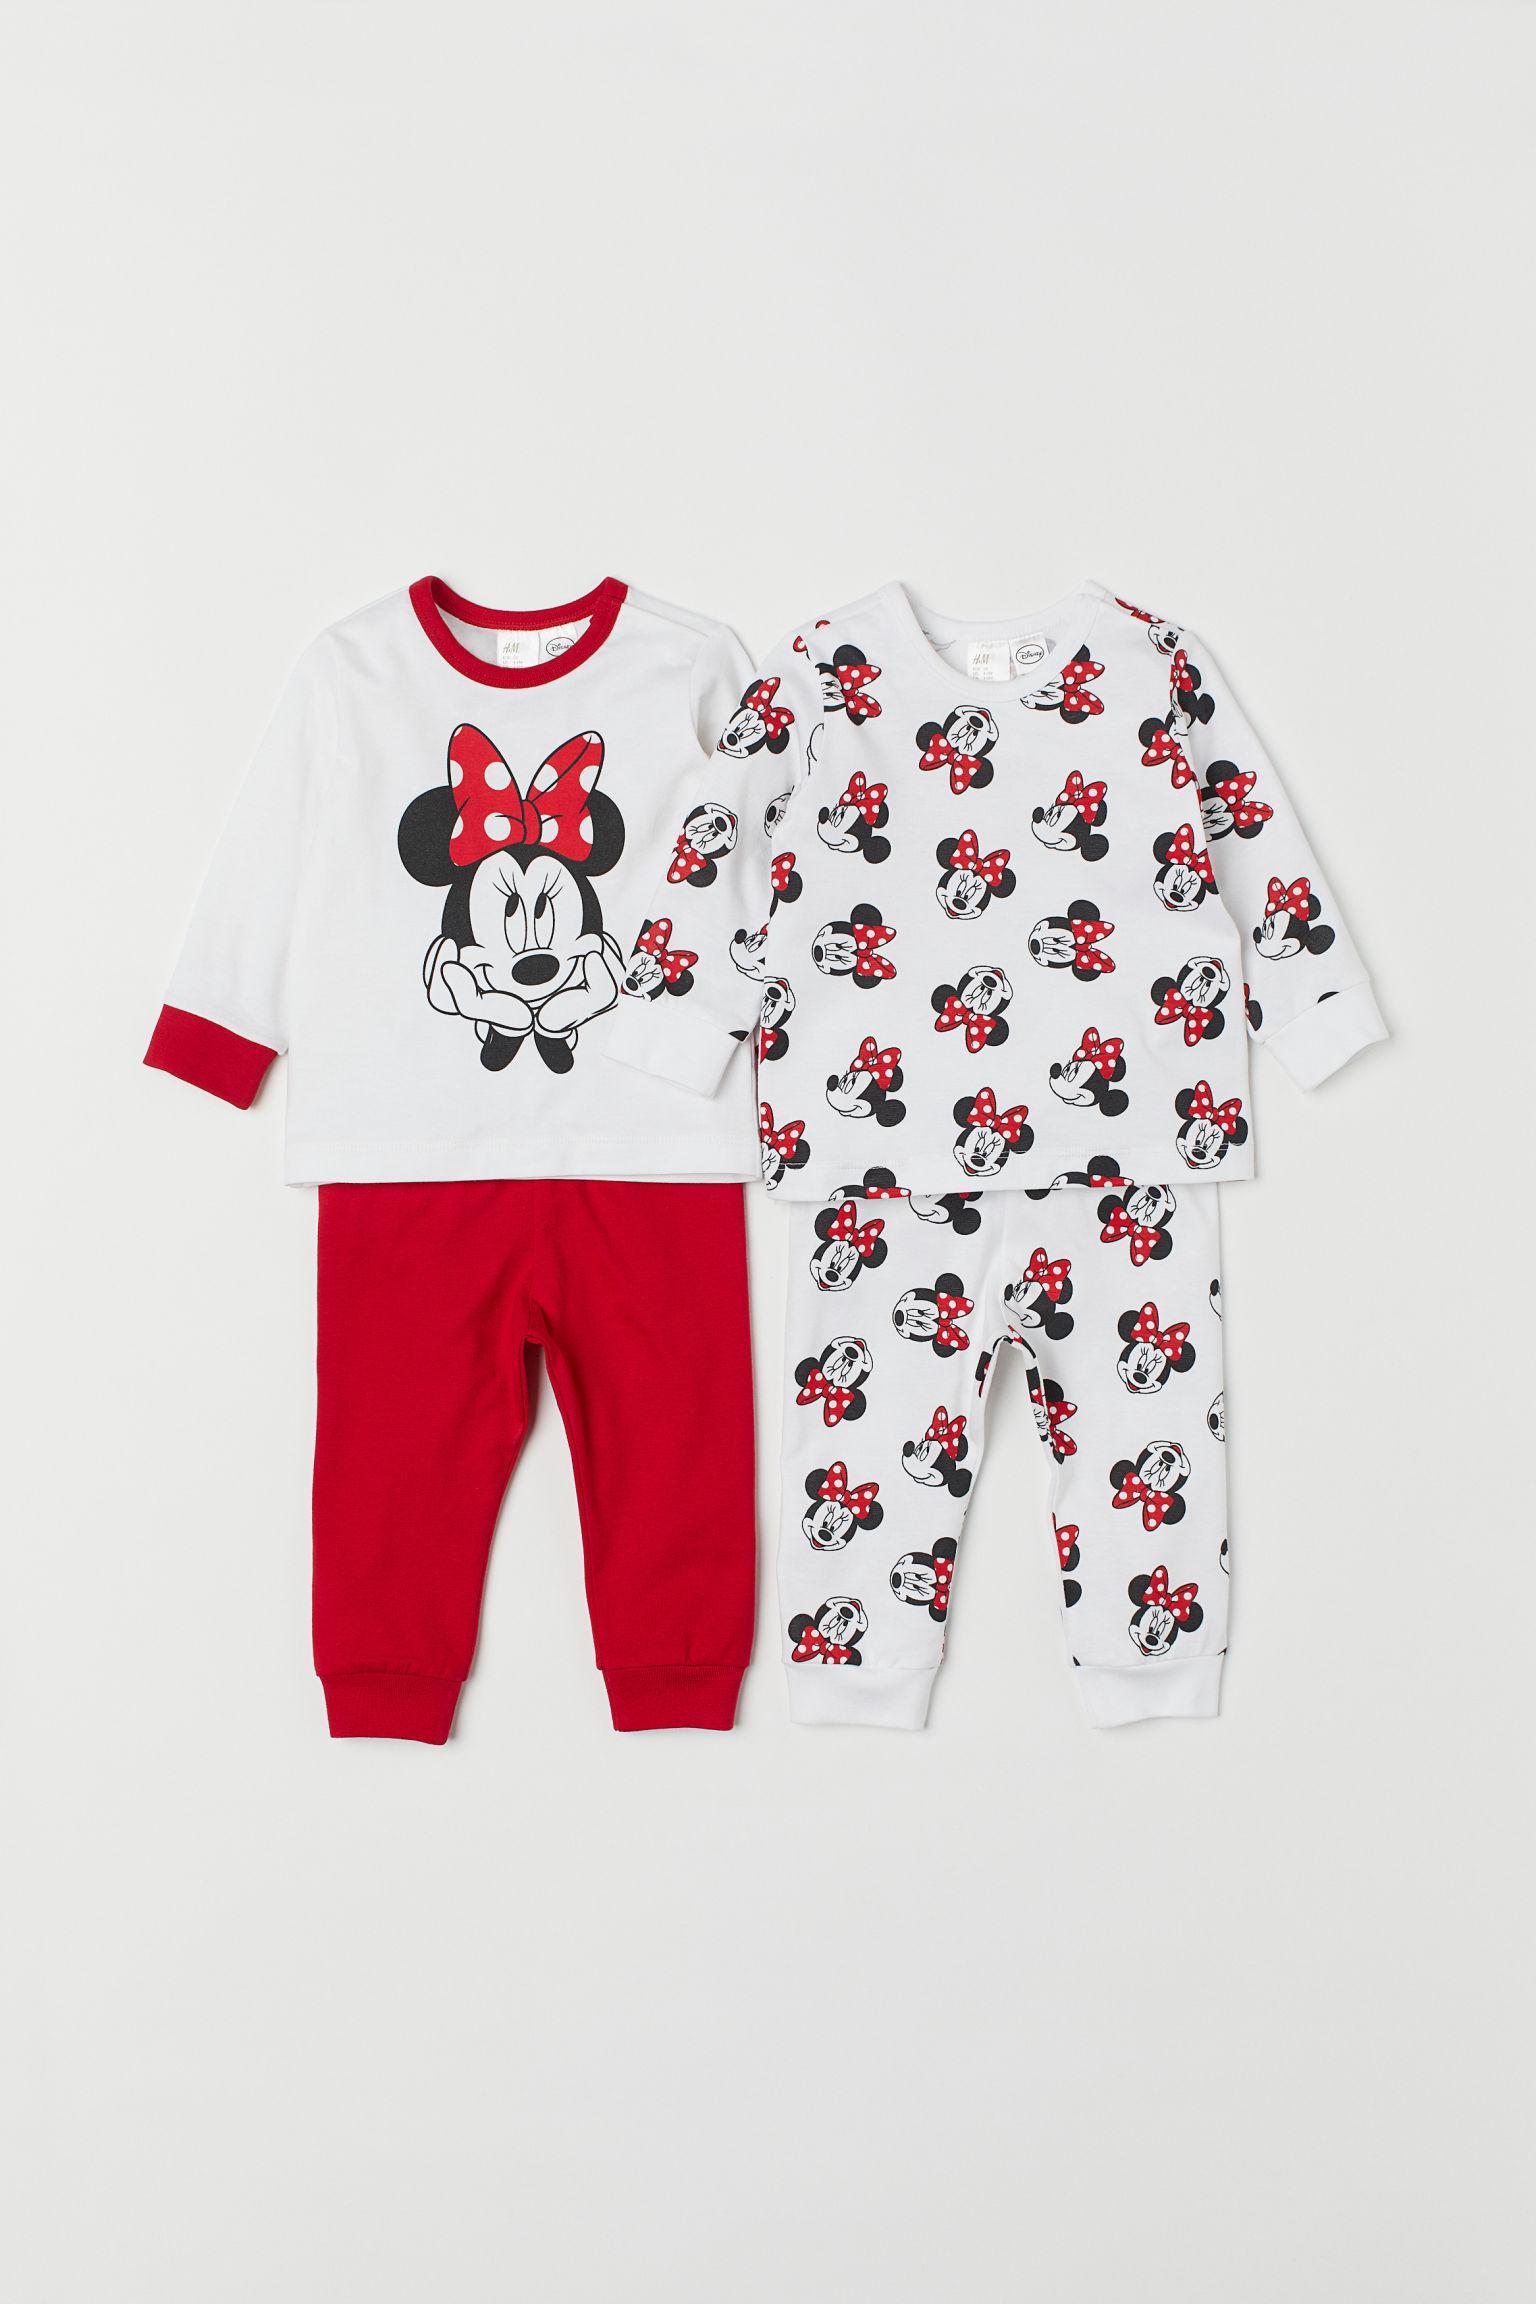 d3ebf6dba H M 2-pack Jersey Pyjamas in Red - Lyst